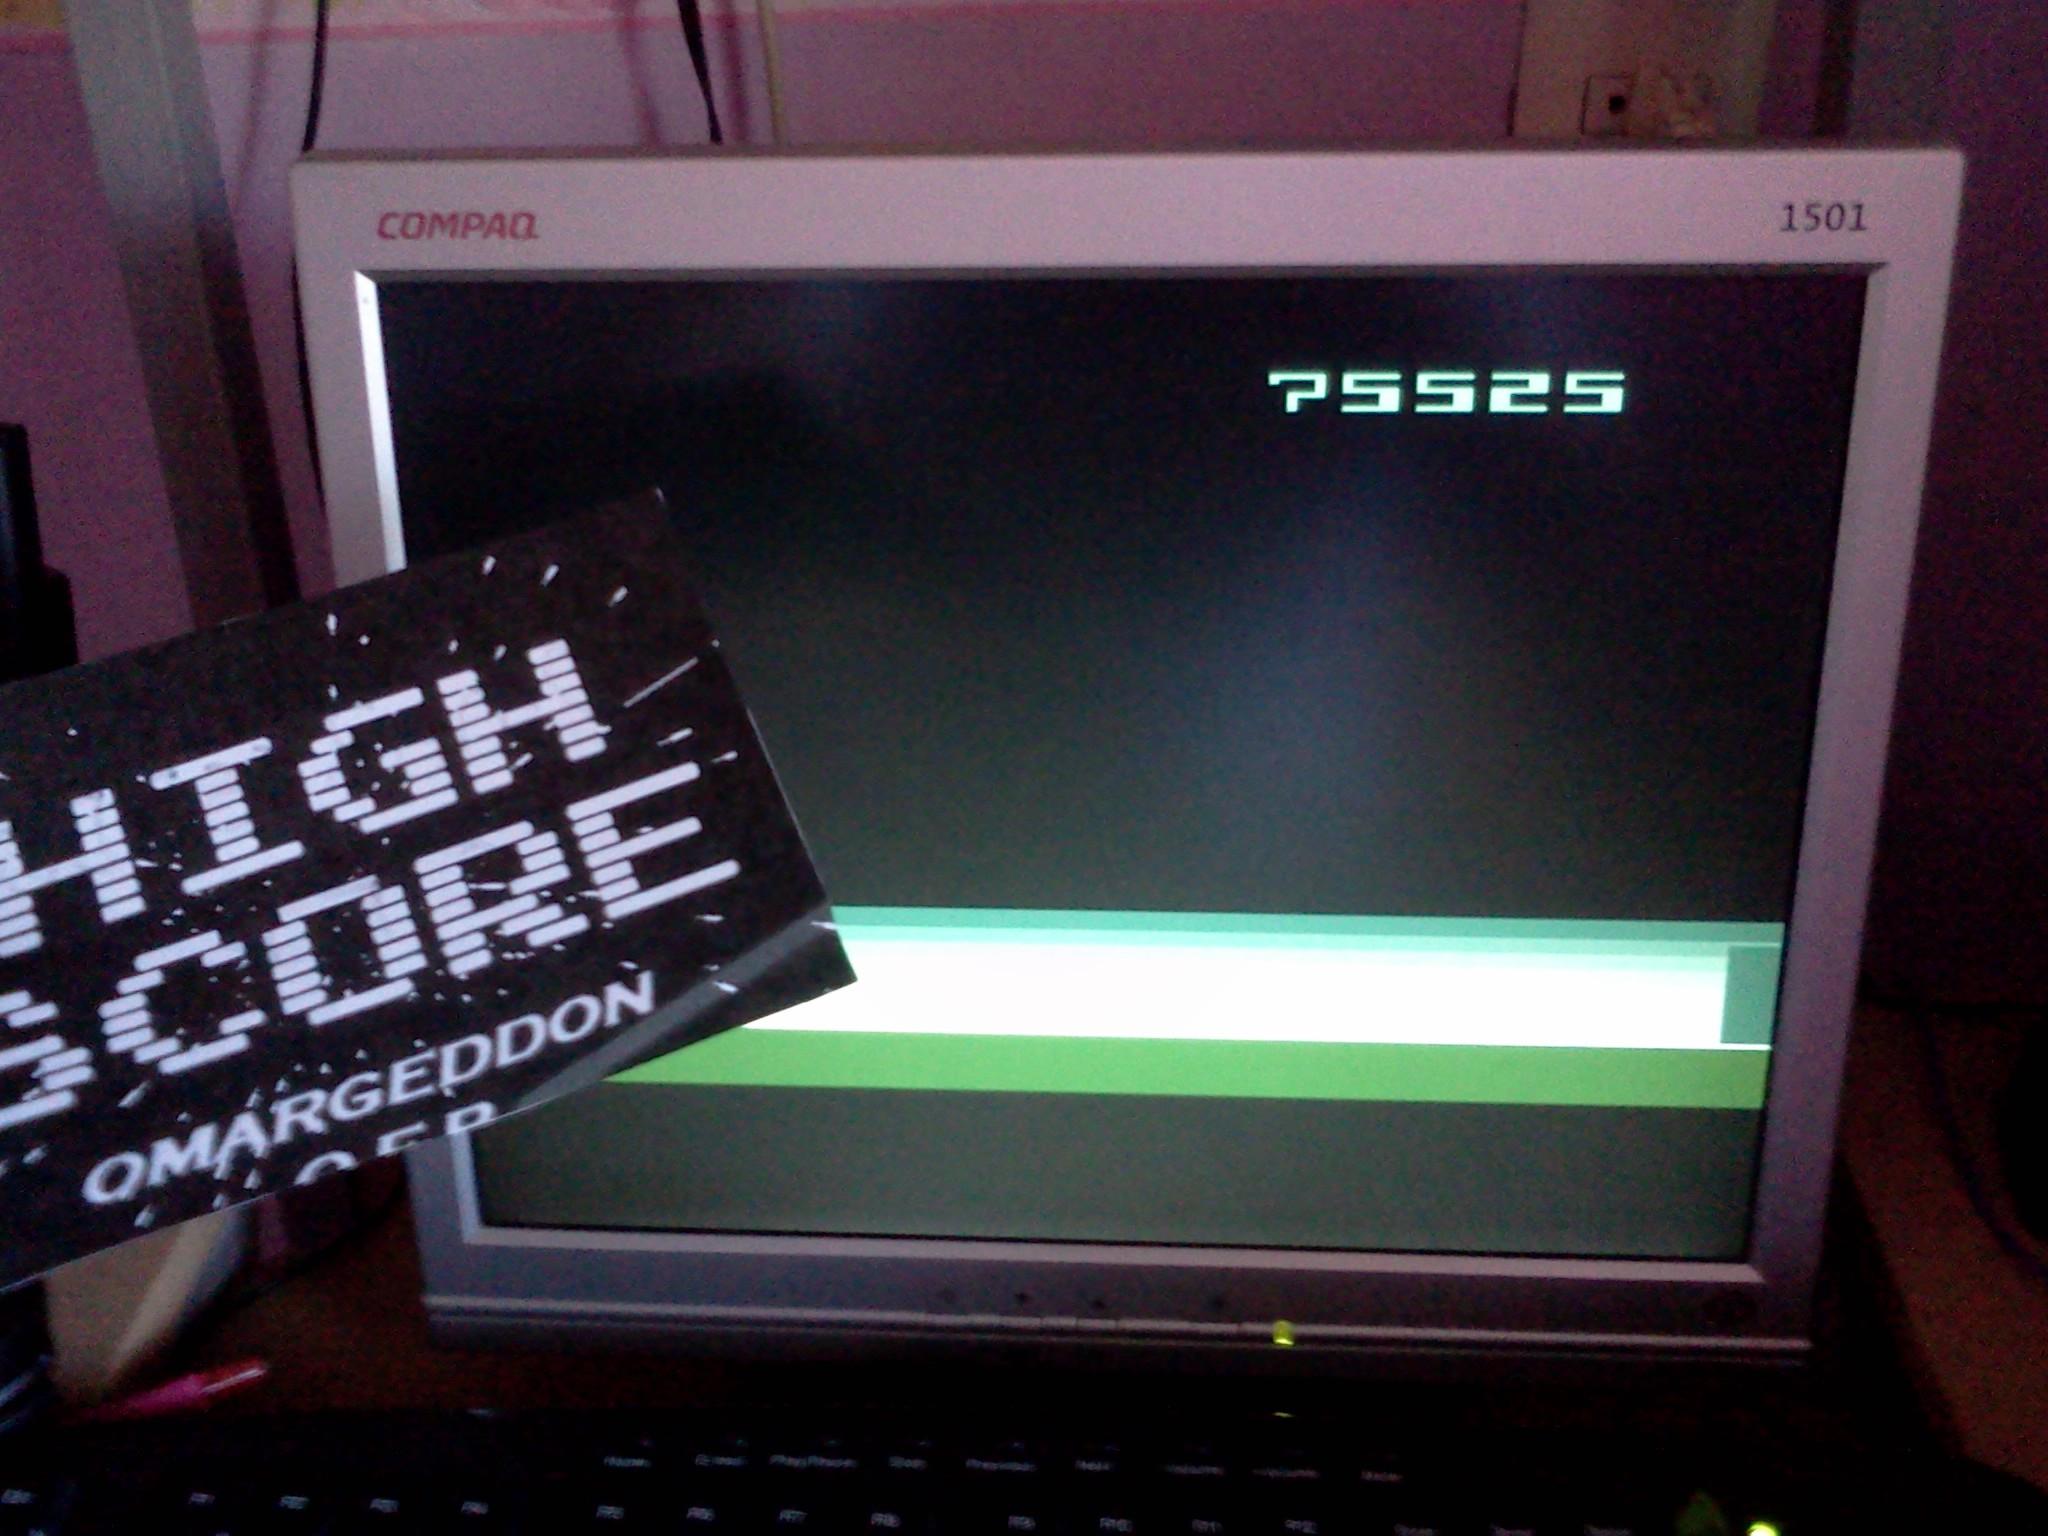 omargeddon: Space Cavern (Atari 2600 Emulated Novice/B Mode) 75,525 points on 2016-08-27 10:10:49